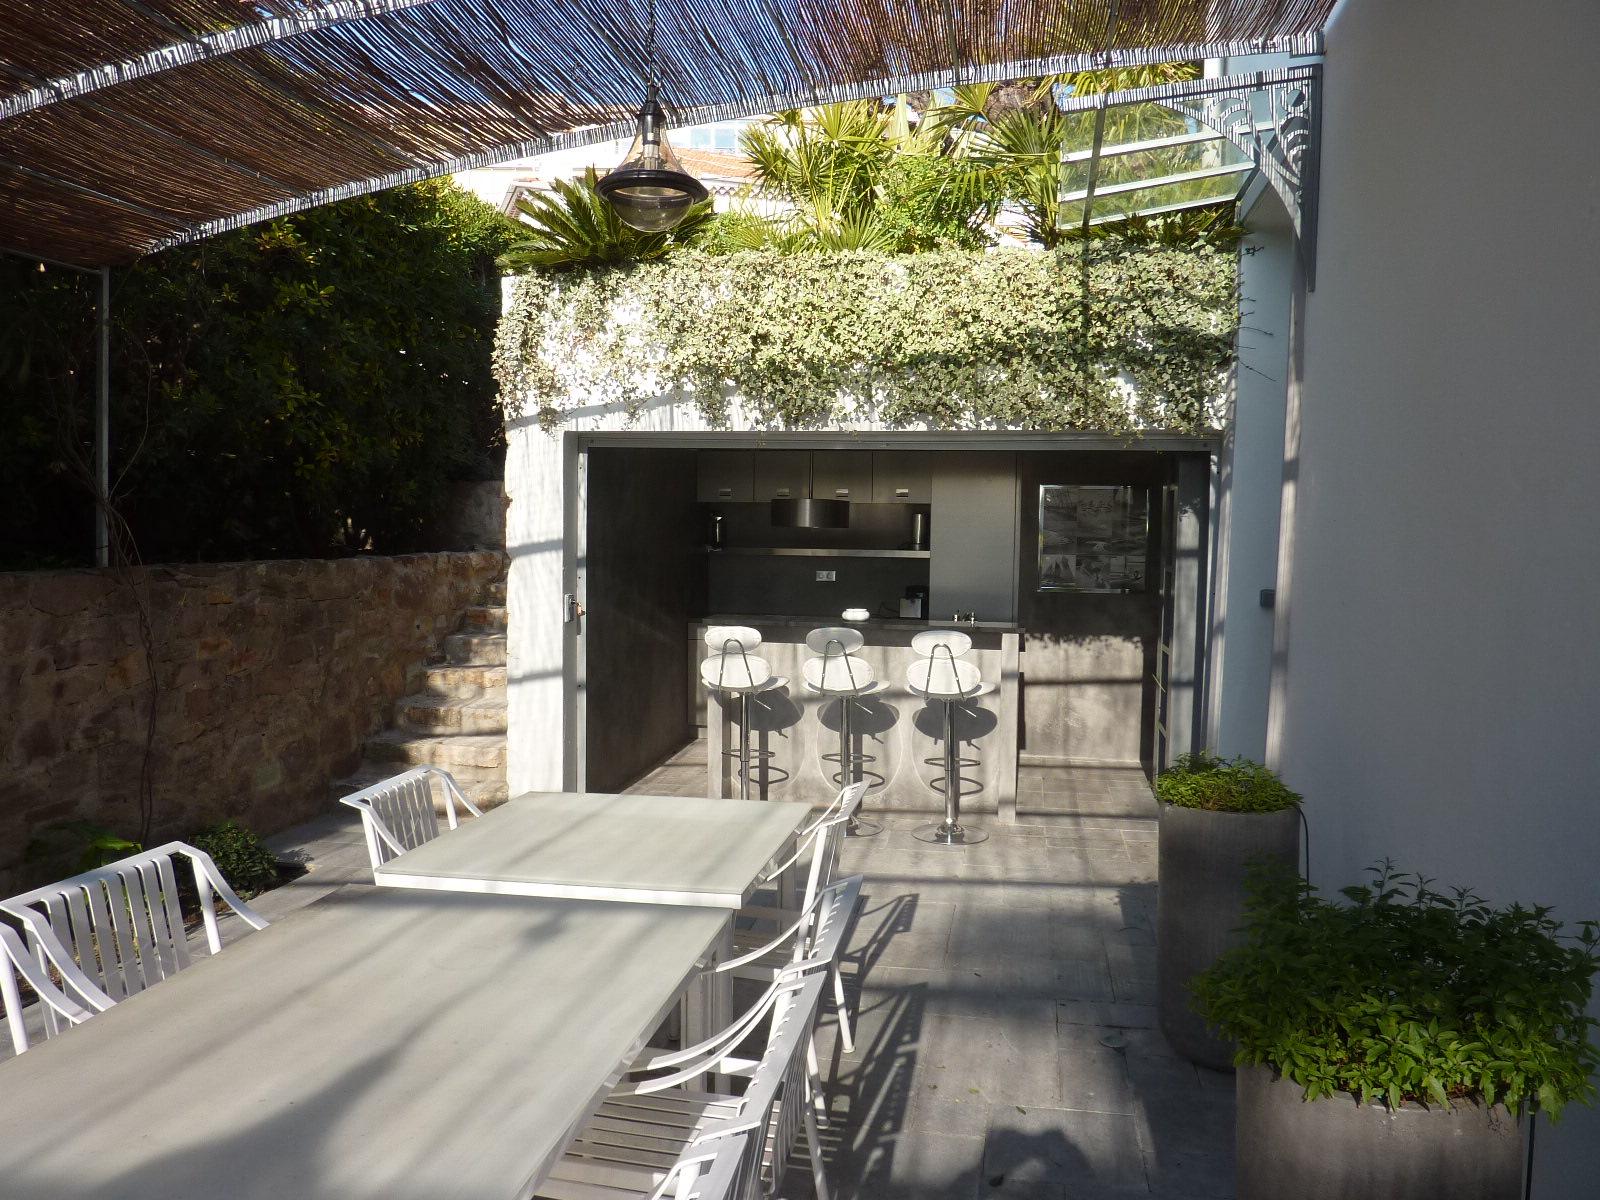 HSUD0021-11a-Pool House.JPG